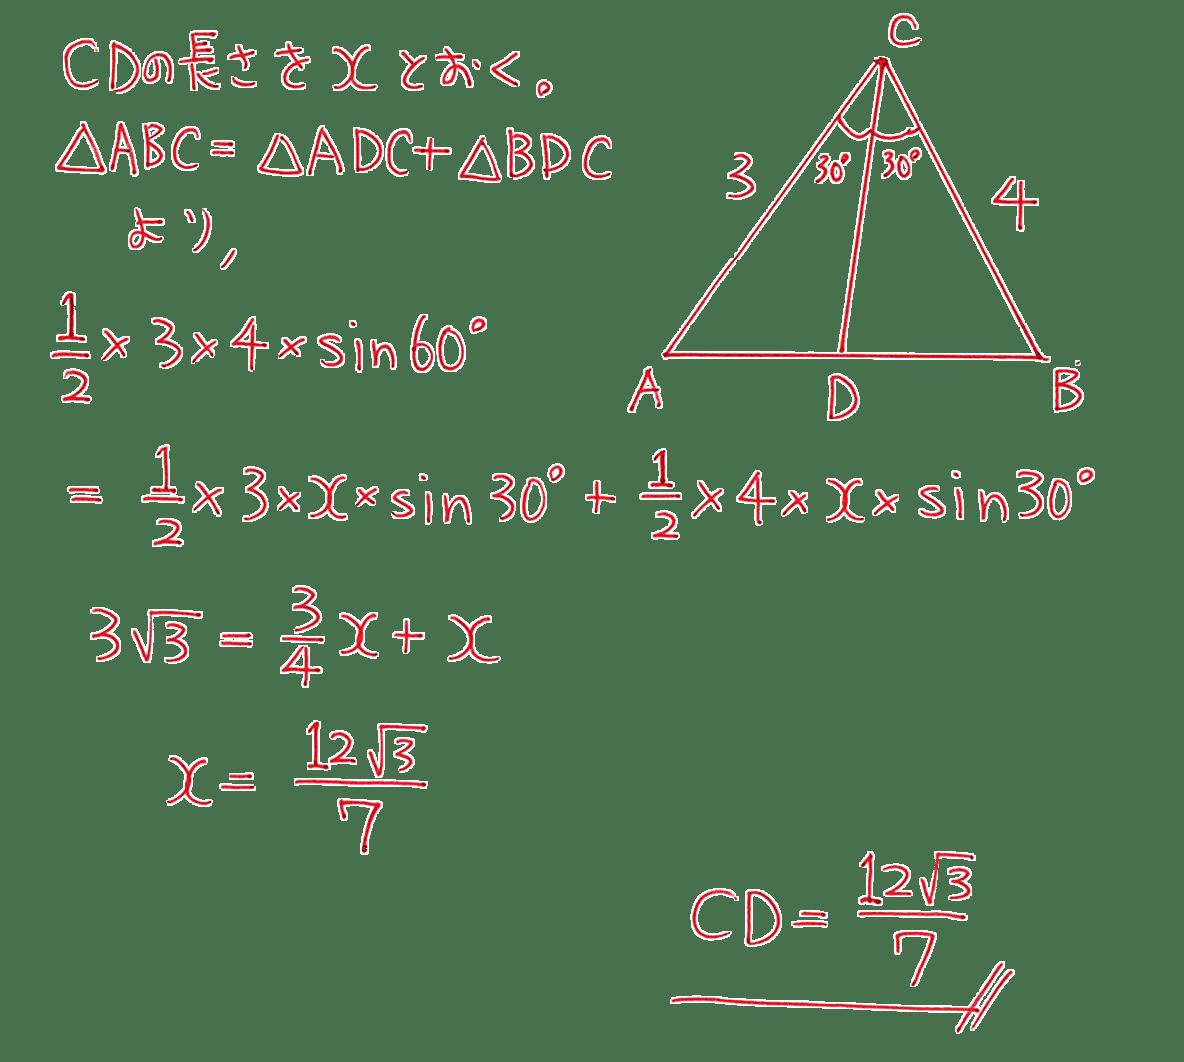 高校数学Ⅰ 三角比34 練習の答え